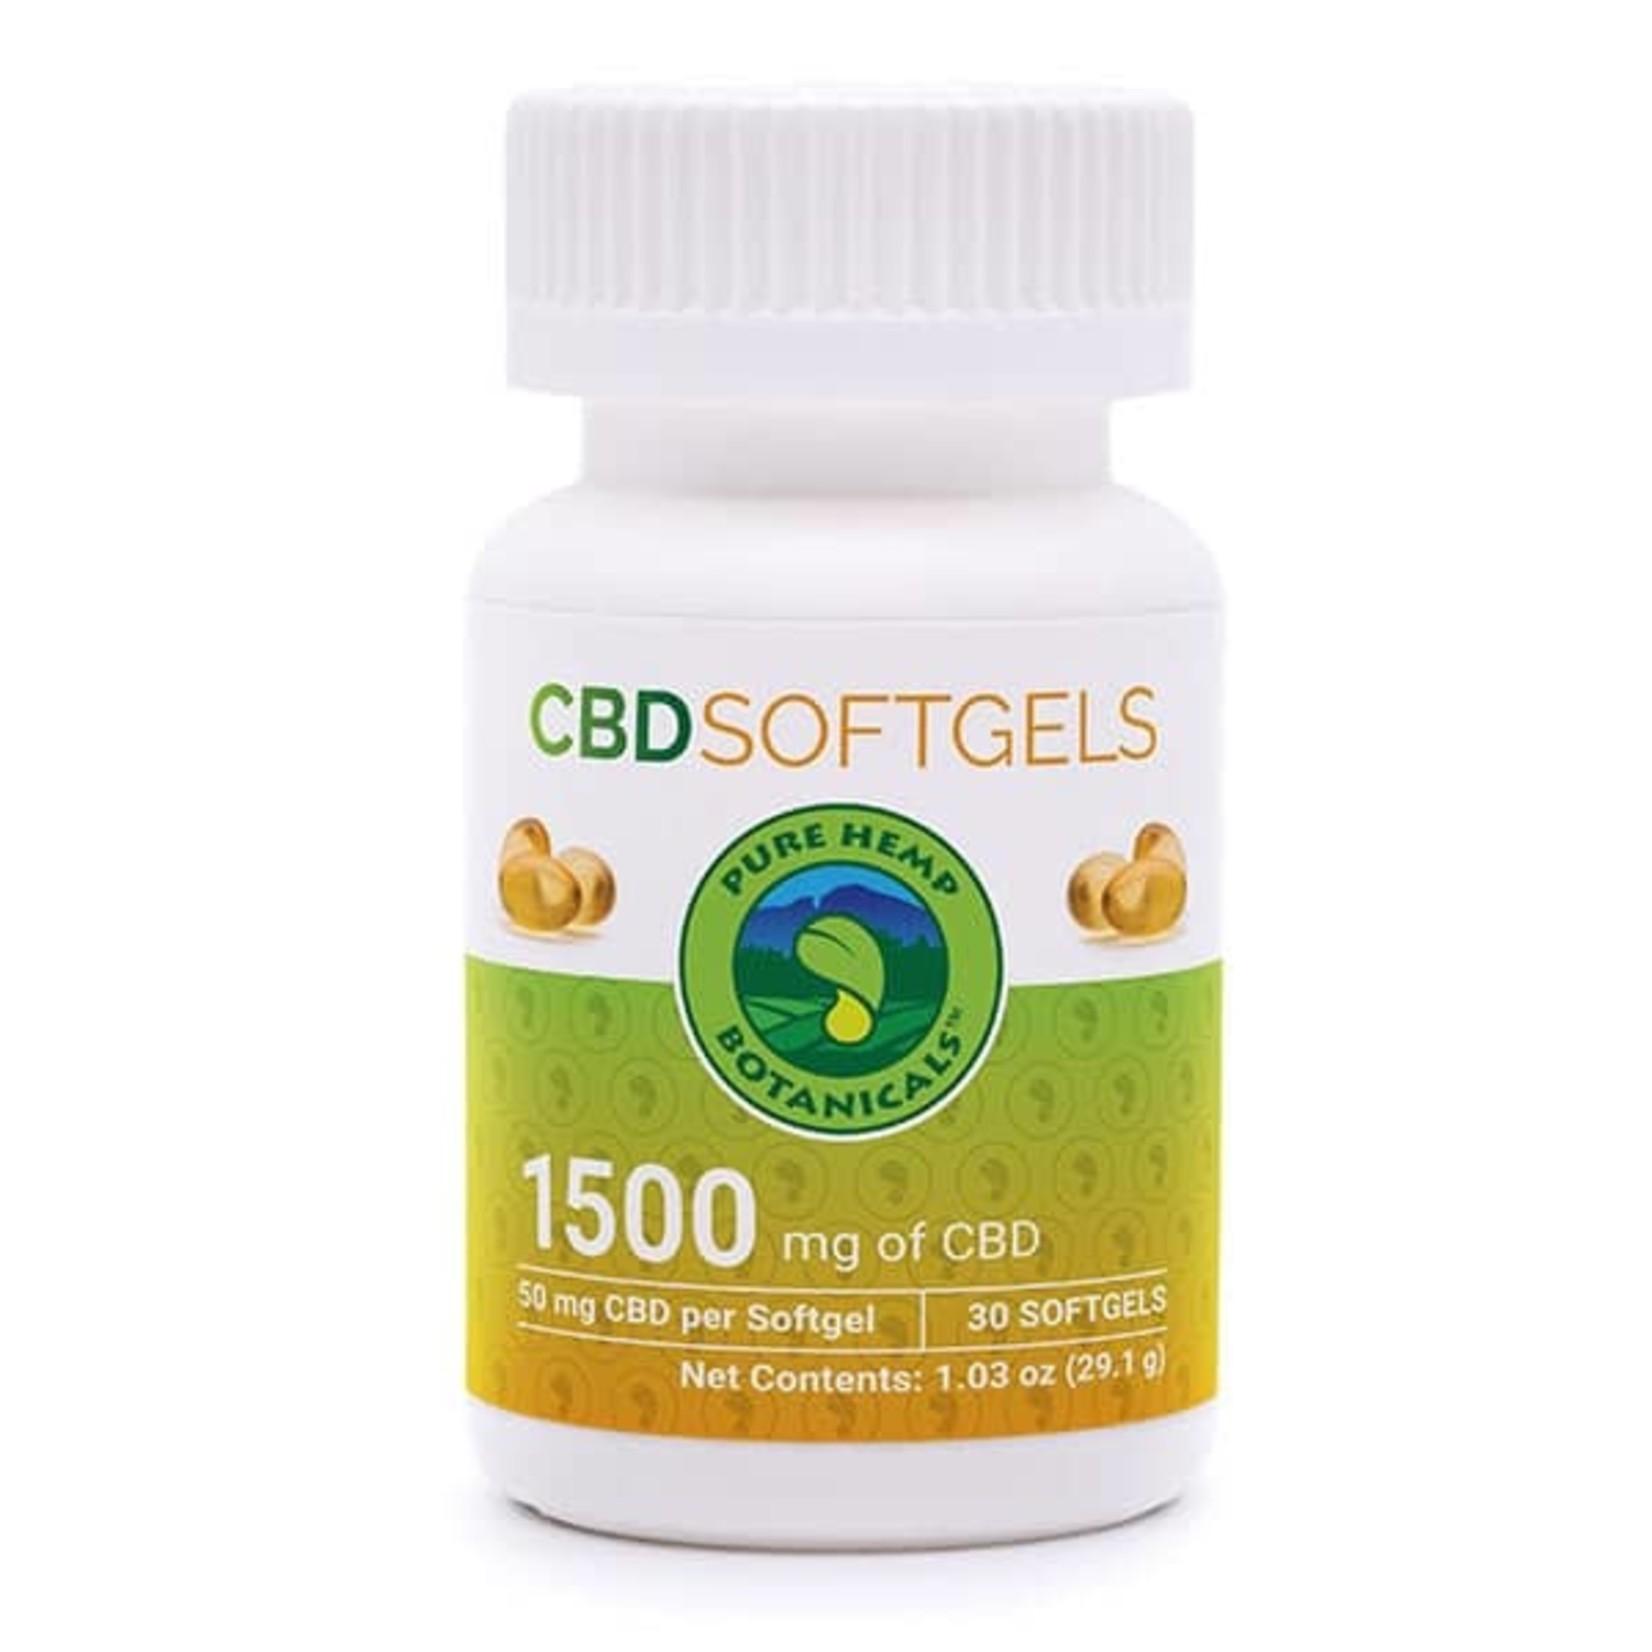 Pure Hemp Botanicals PHB CBD Softgels 1500mg / 50mg 30ct